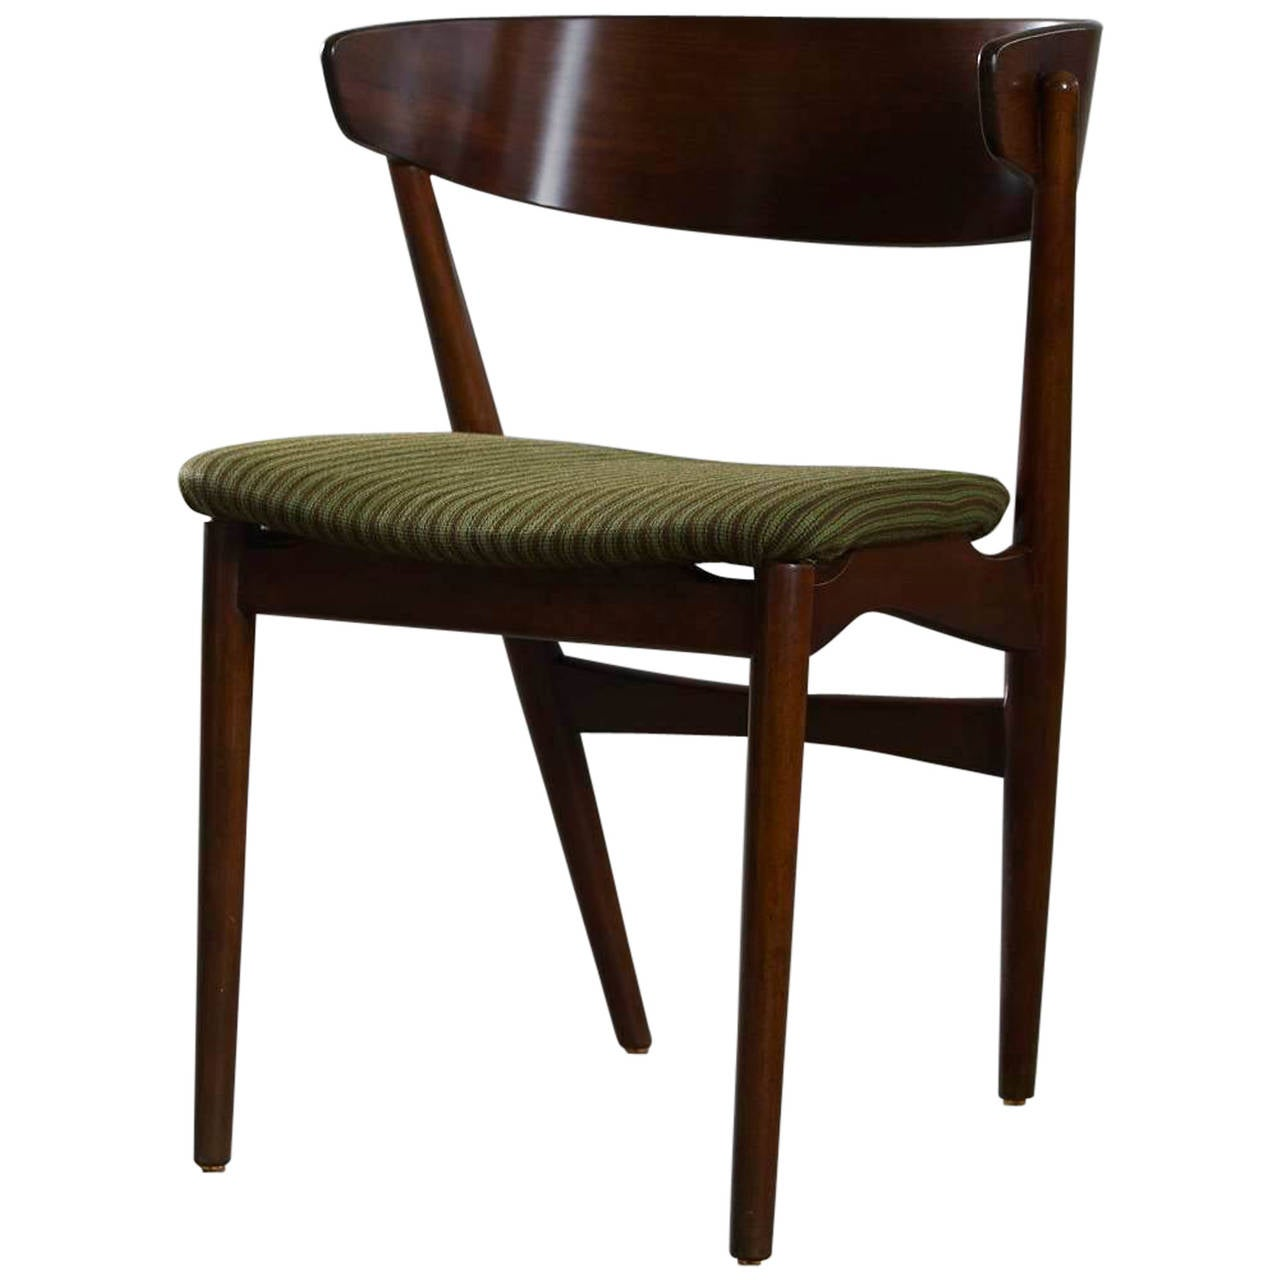 Super stylish side chair in teak by kai kristiansen at 1stdibs - Kai kristiansen chair ...